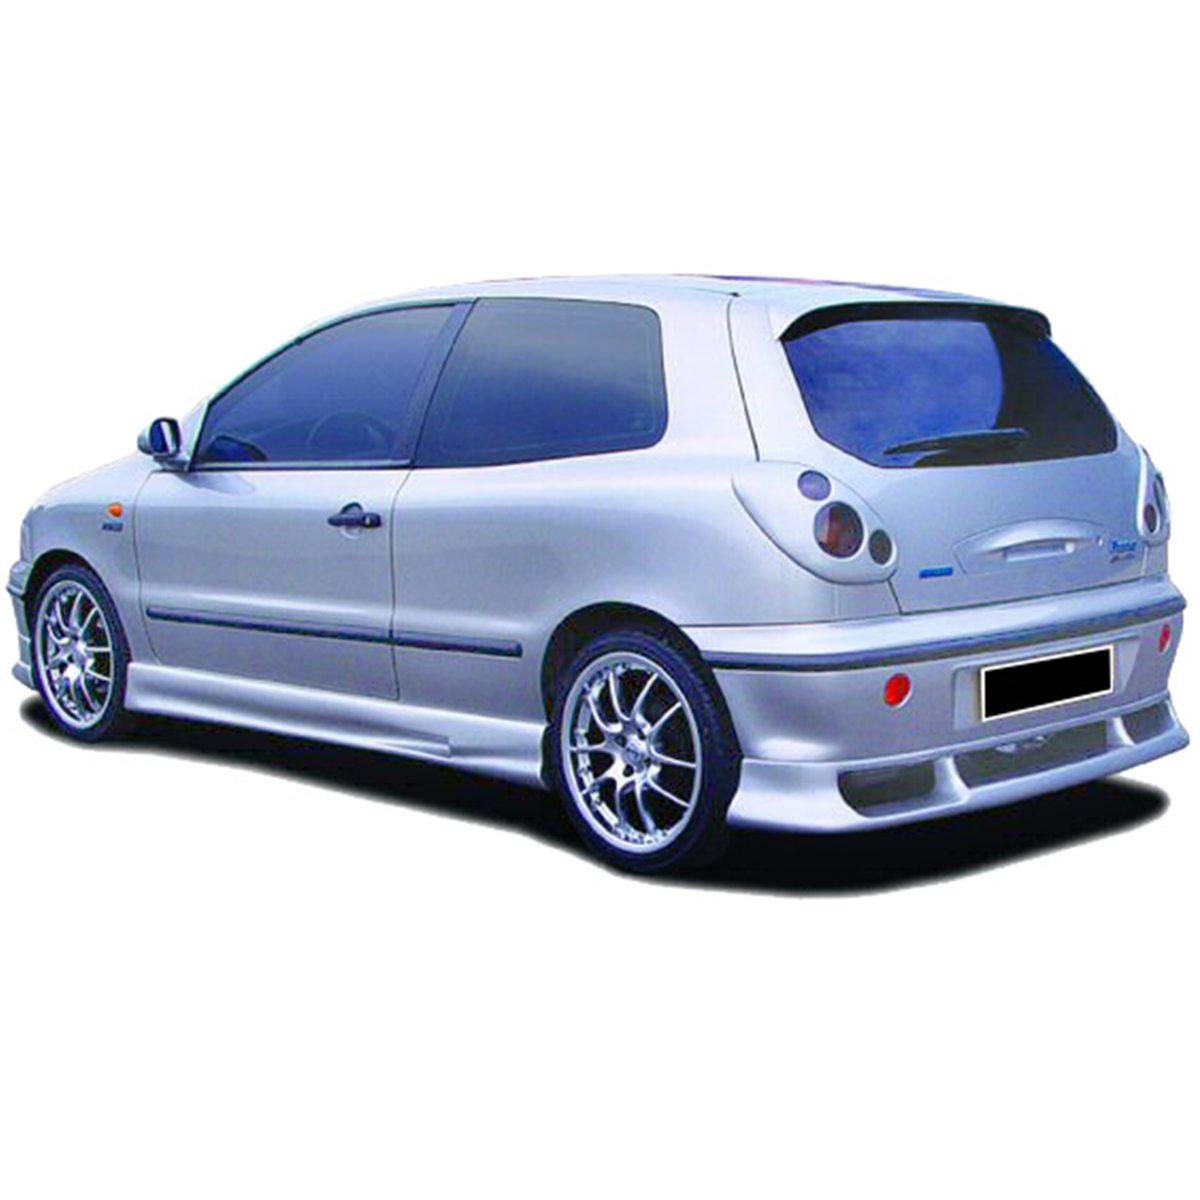 Fiat-Bravo-Speed-Tras-SPA012